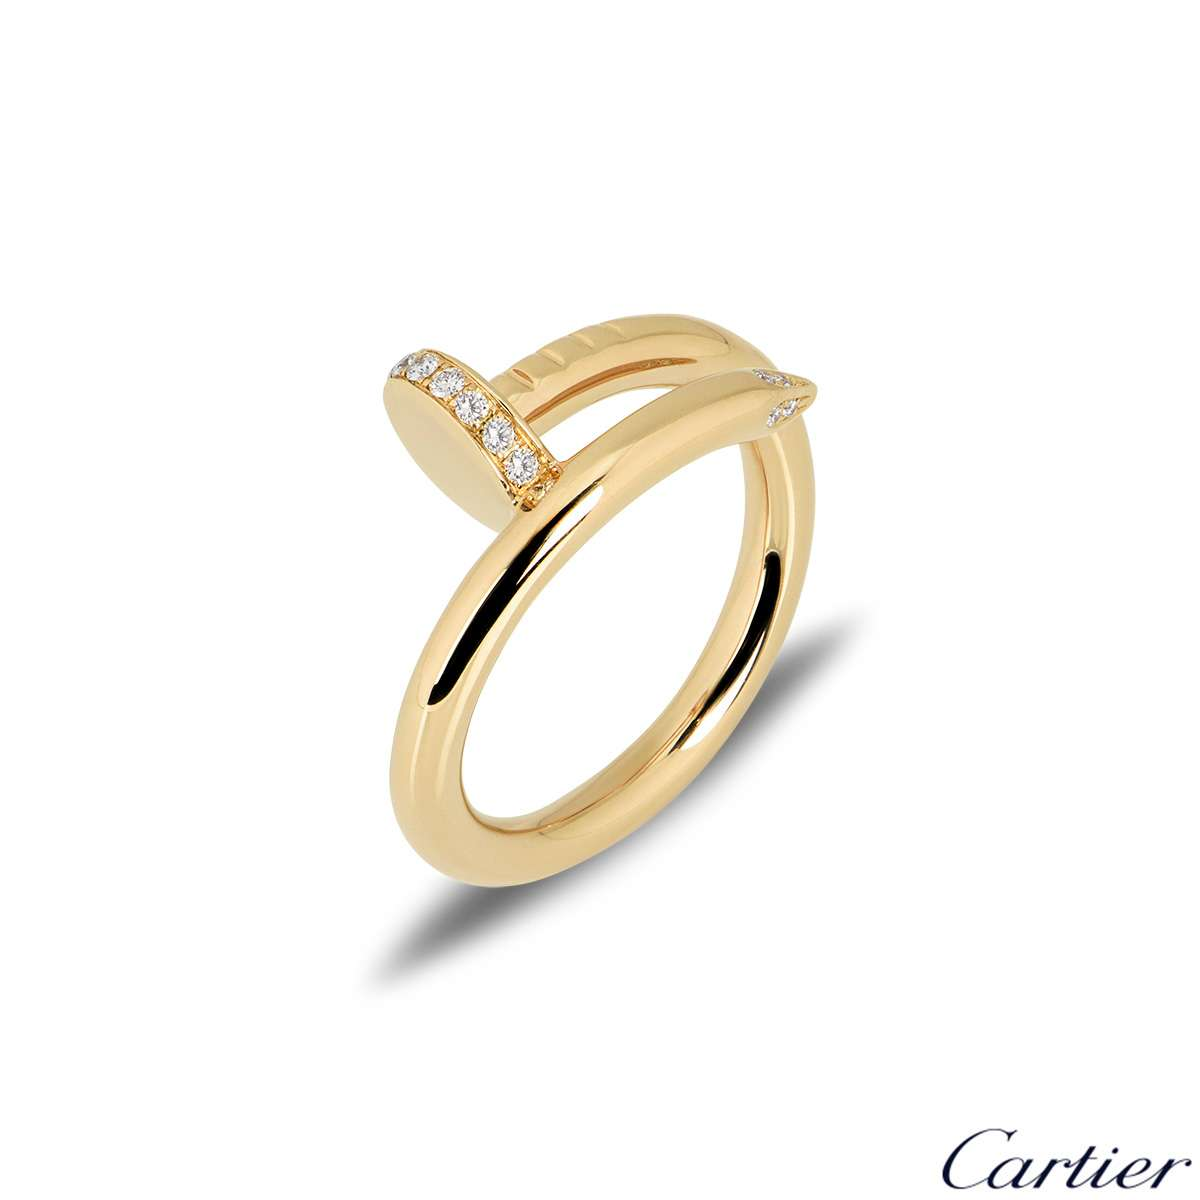 Cartier Yellow Gold Diamond Juste Un Clou Ring Size 53 B4216900